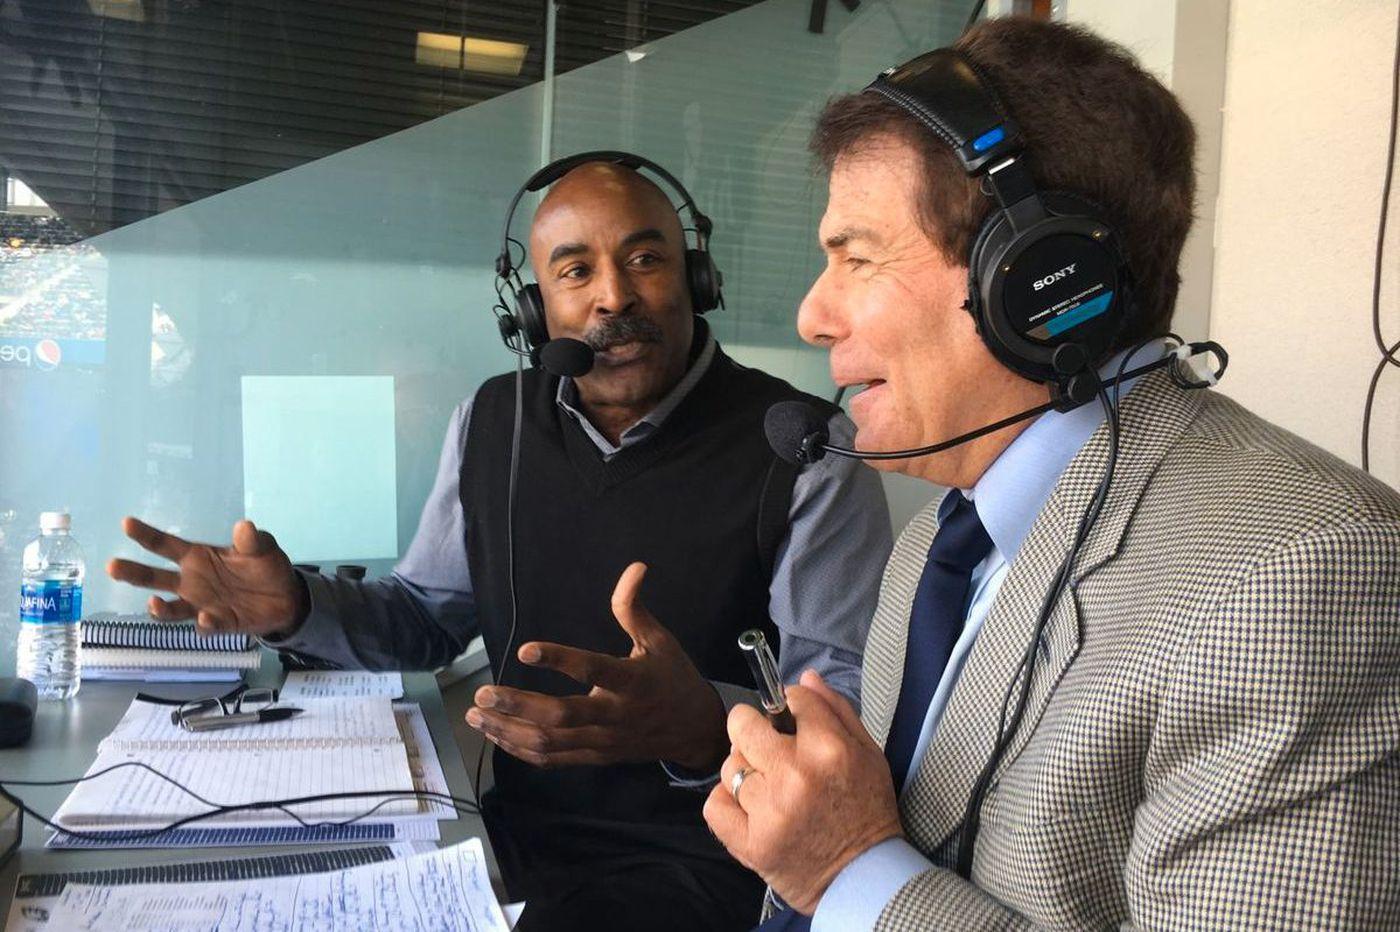 Will radio flourish? Entercom stabilizes, thinks sports gambling could add $100 million in revenue